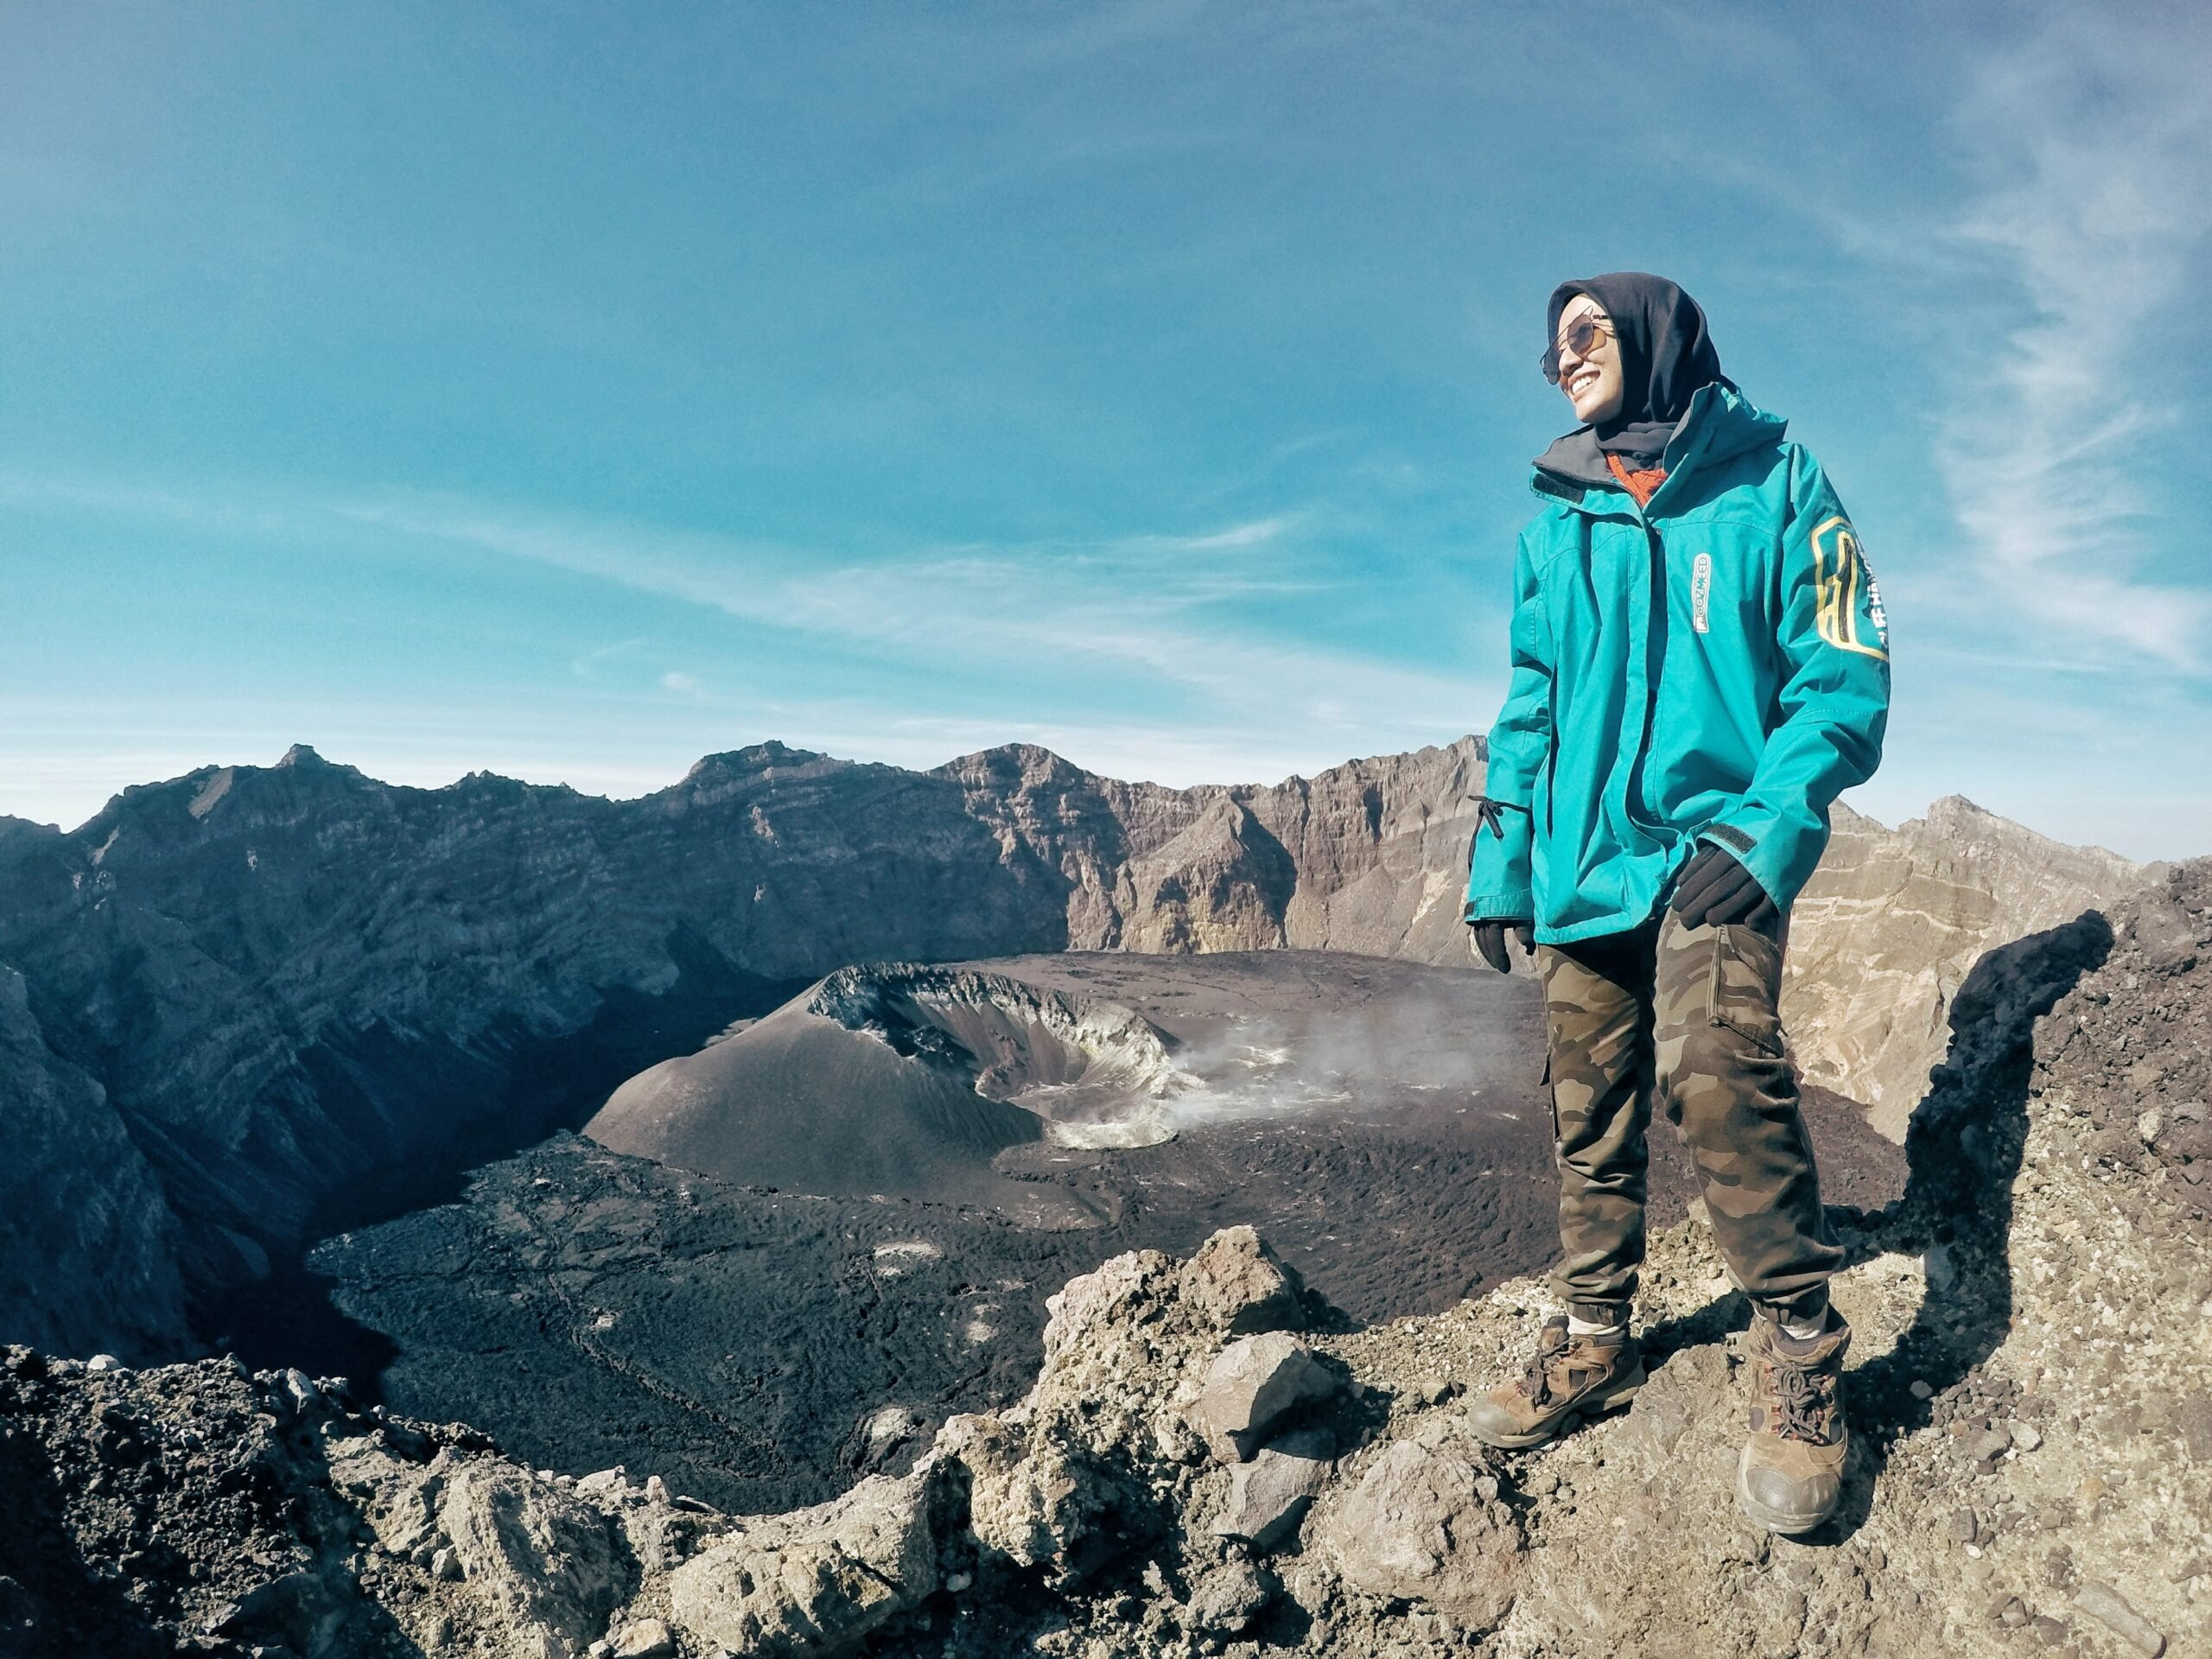 Gambar Pesona Gunung Rinjani: Jalur Resmi, Syarat dan Tips Mendaki Aman 10